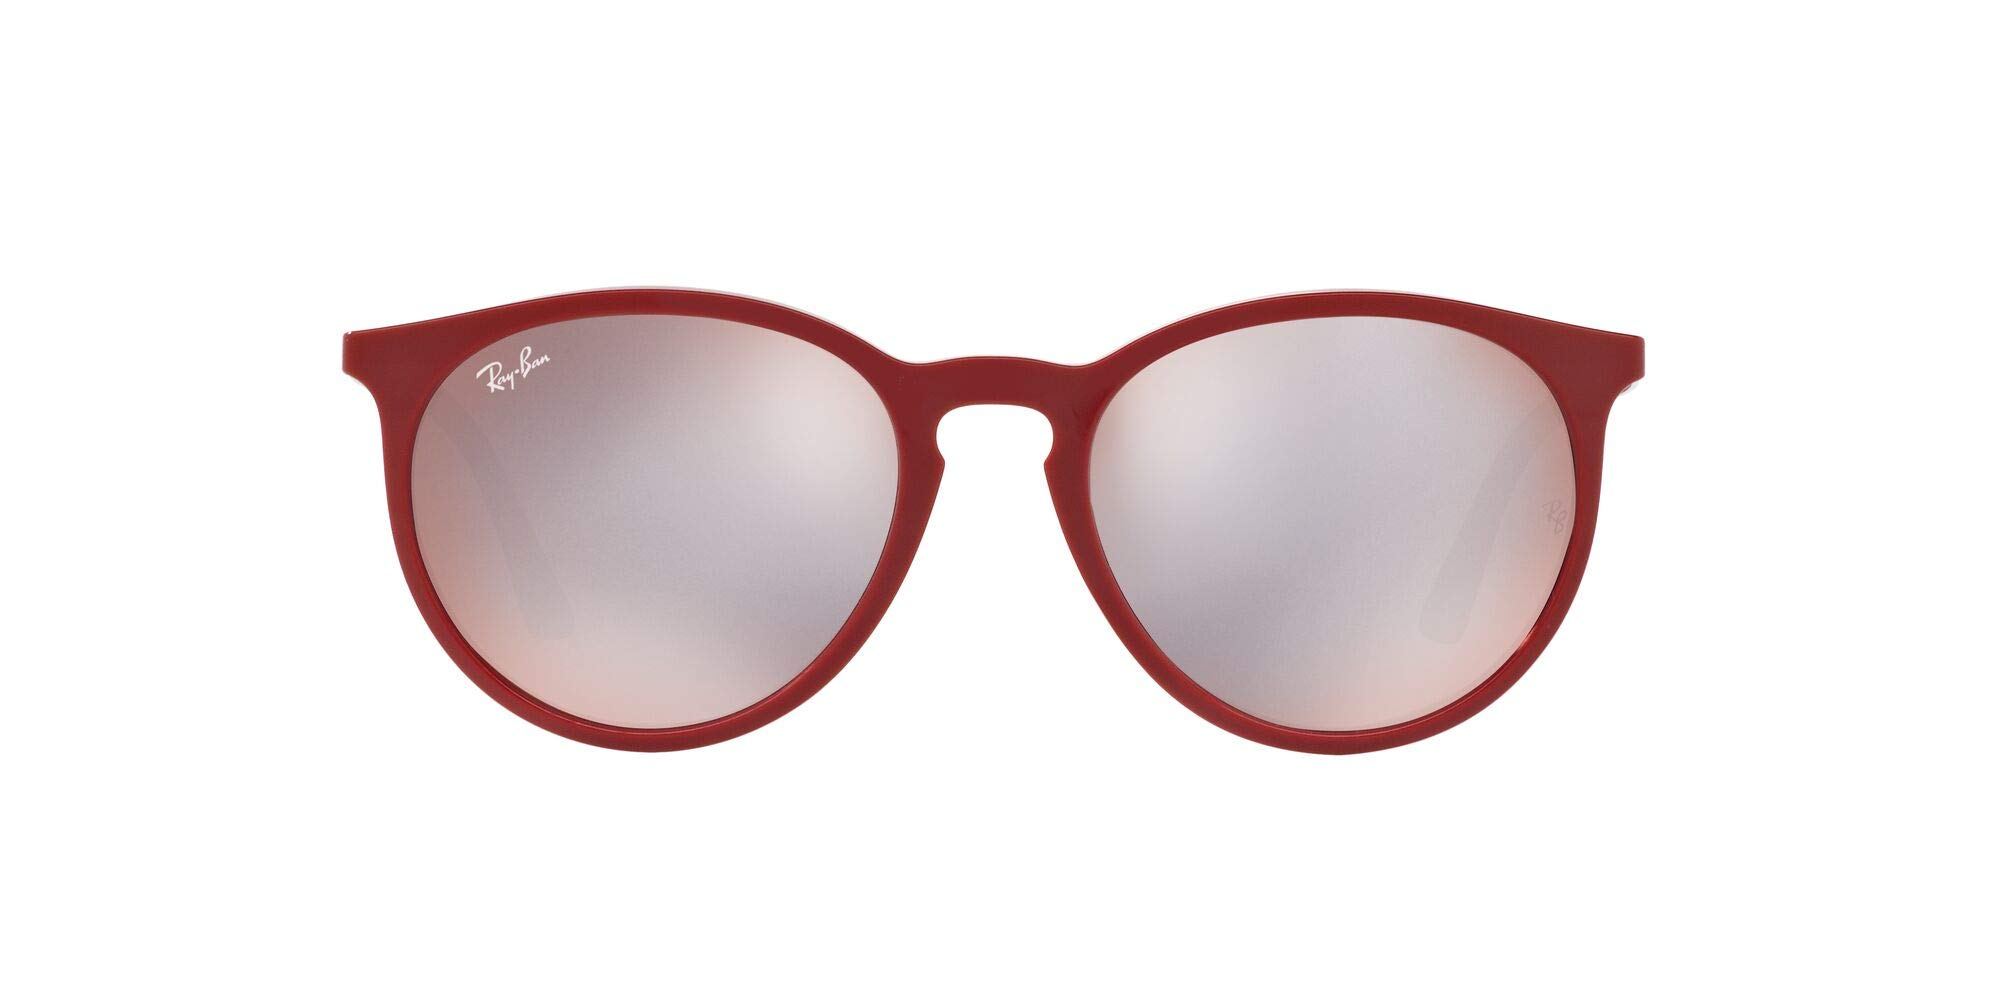 Ray-Ban Men's Rb4274 Round Sunglasses